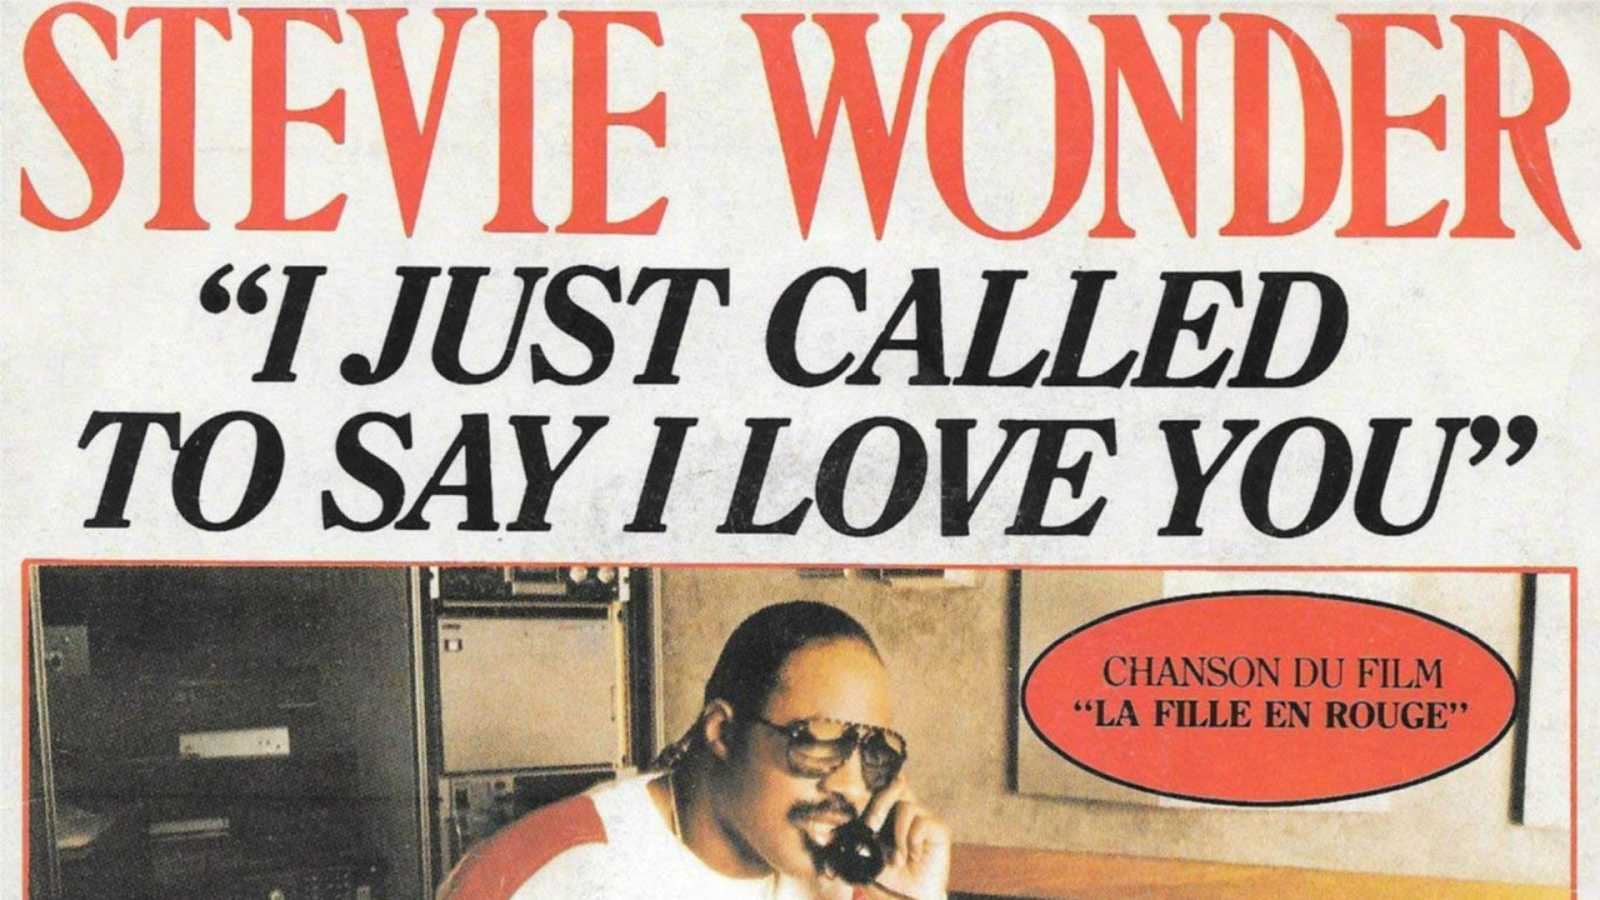 Rebobinando - Stevie Wonder ' I just called to say I love you' - 25/09/20 - escuchar ahora